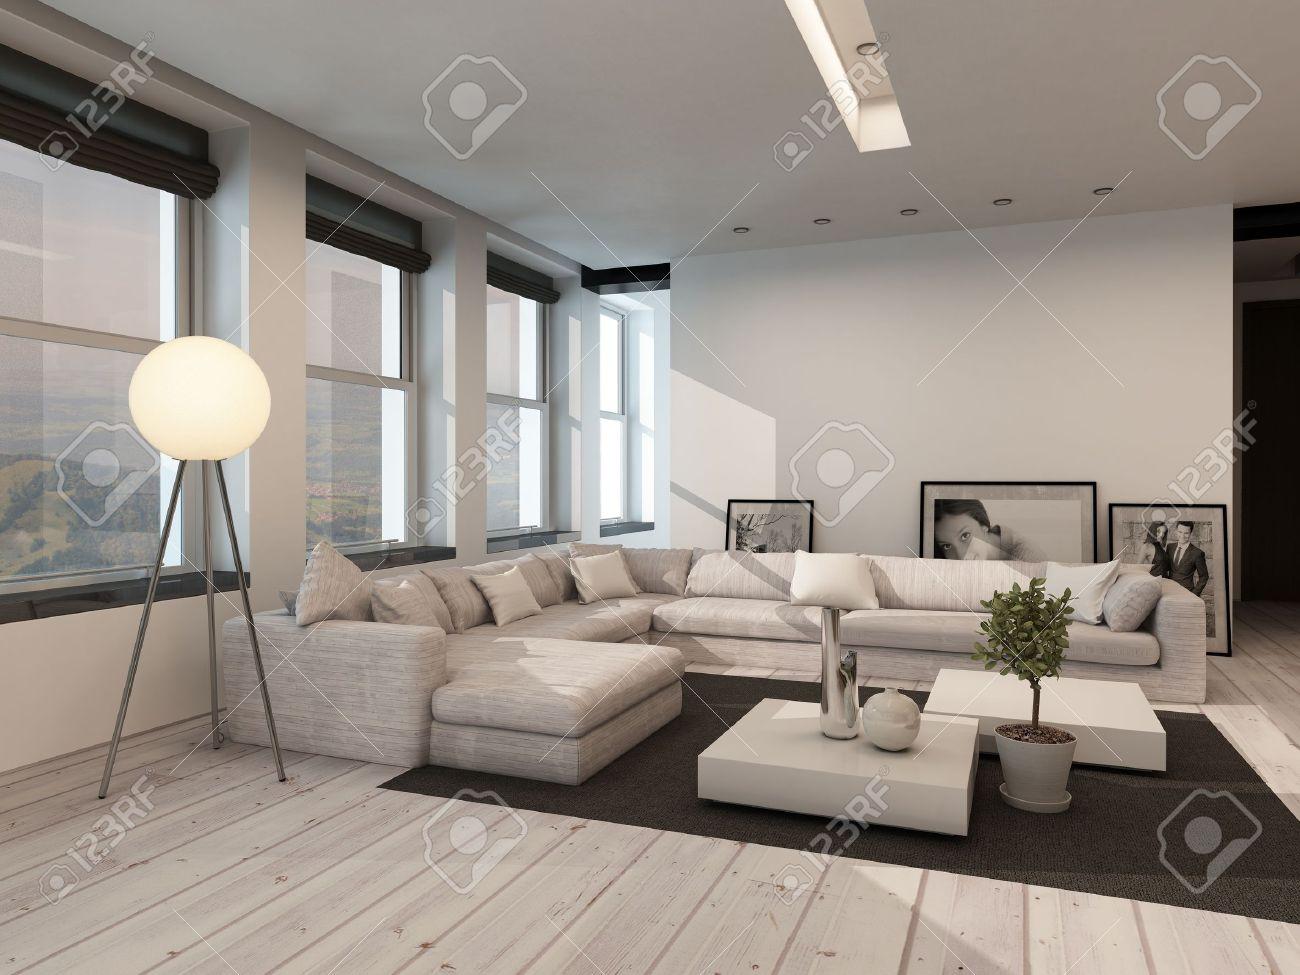 Moderne zwarte en witte woonkamer interieur met geschilderde witte ...